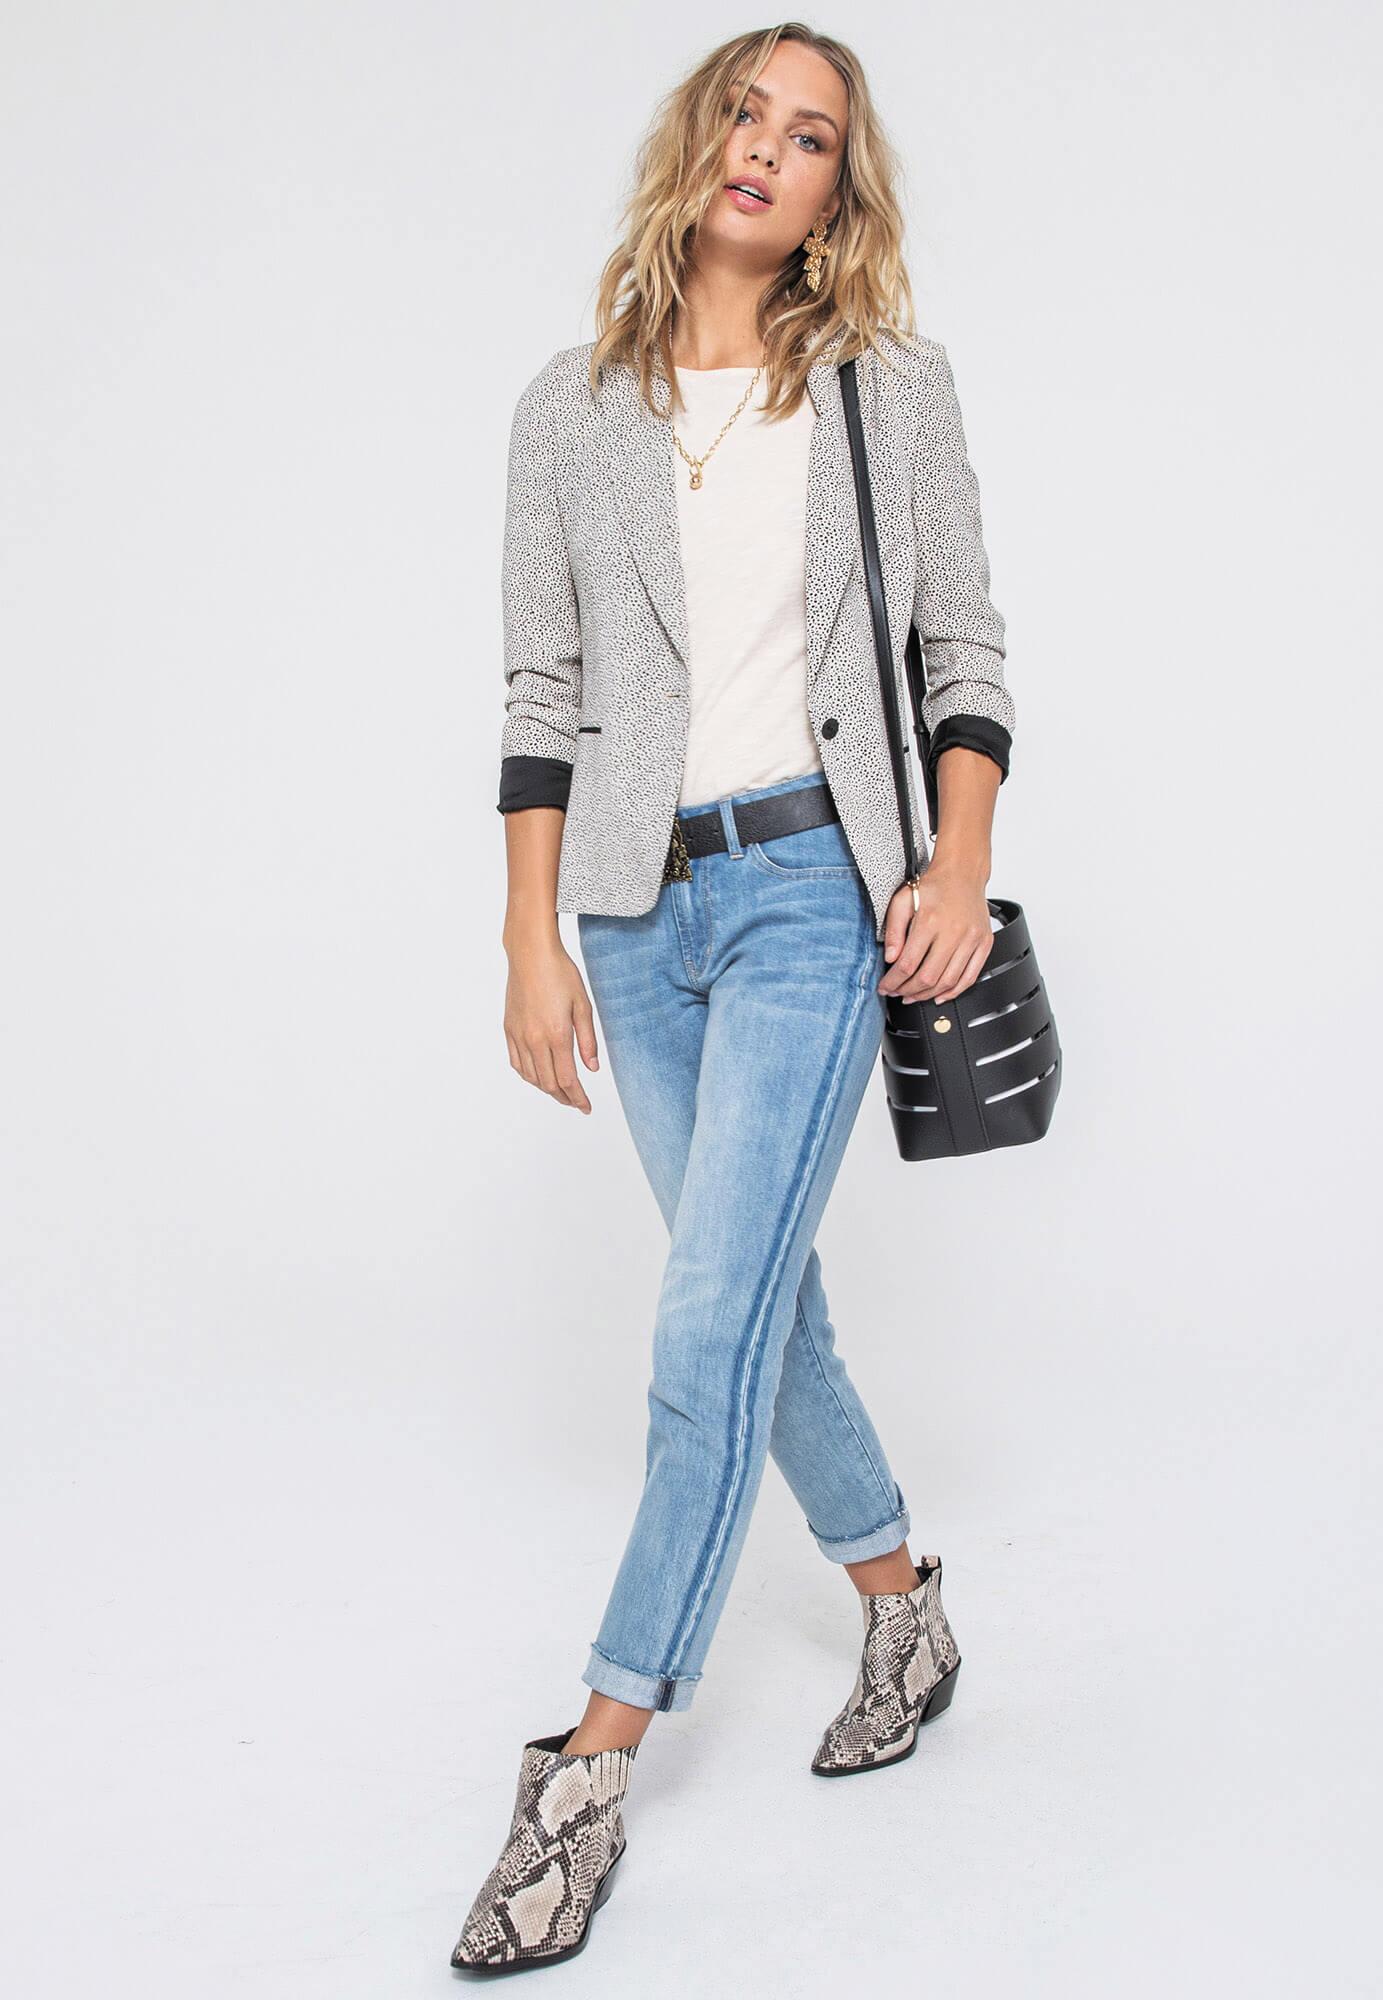 Tendance mode : le jean